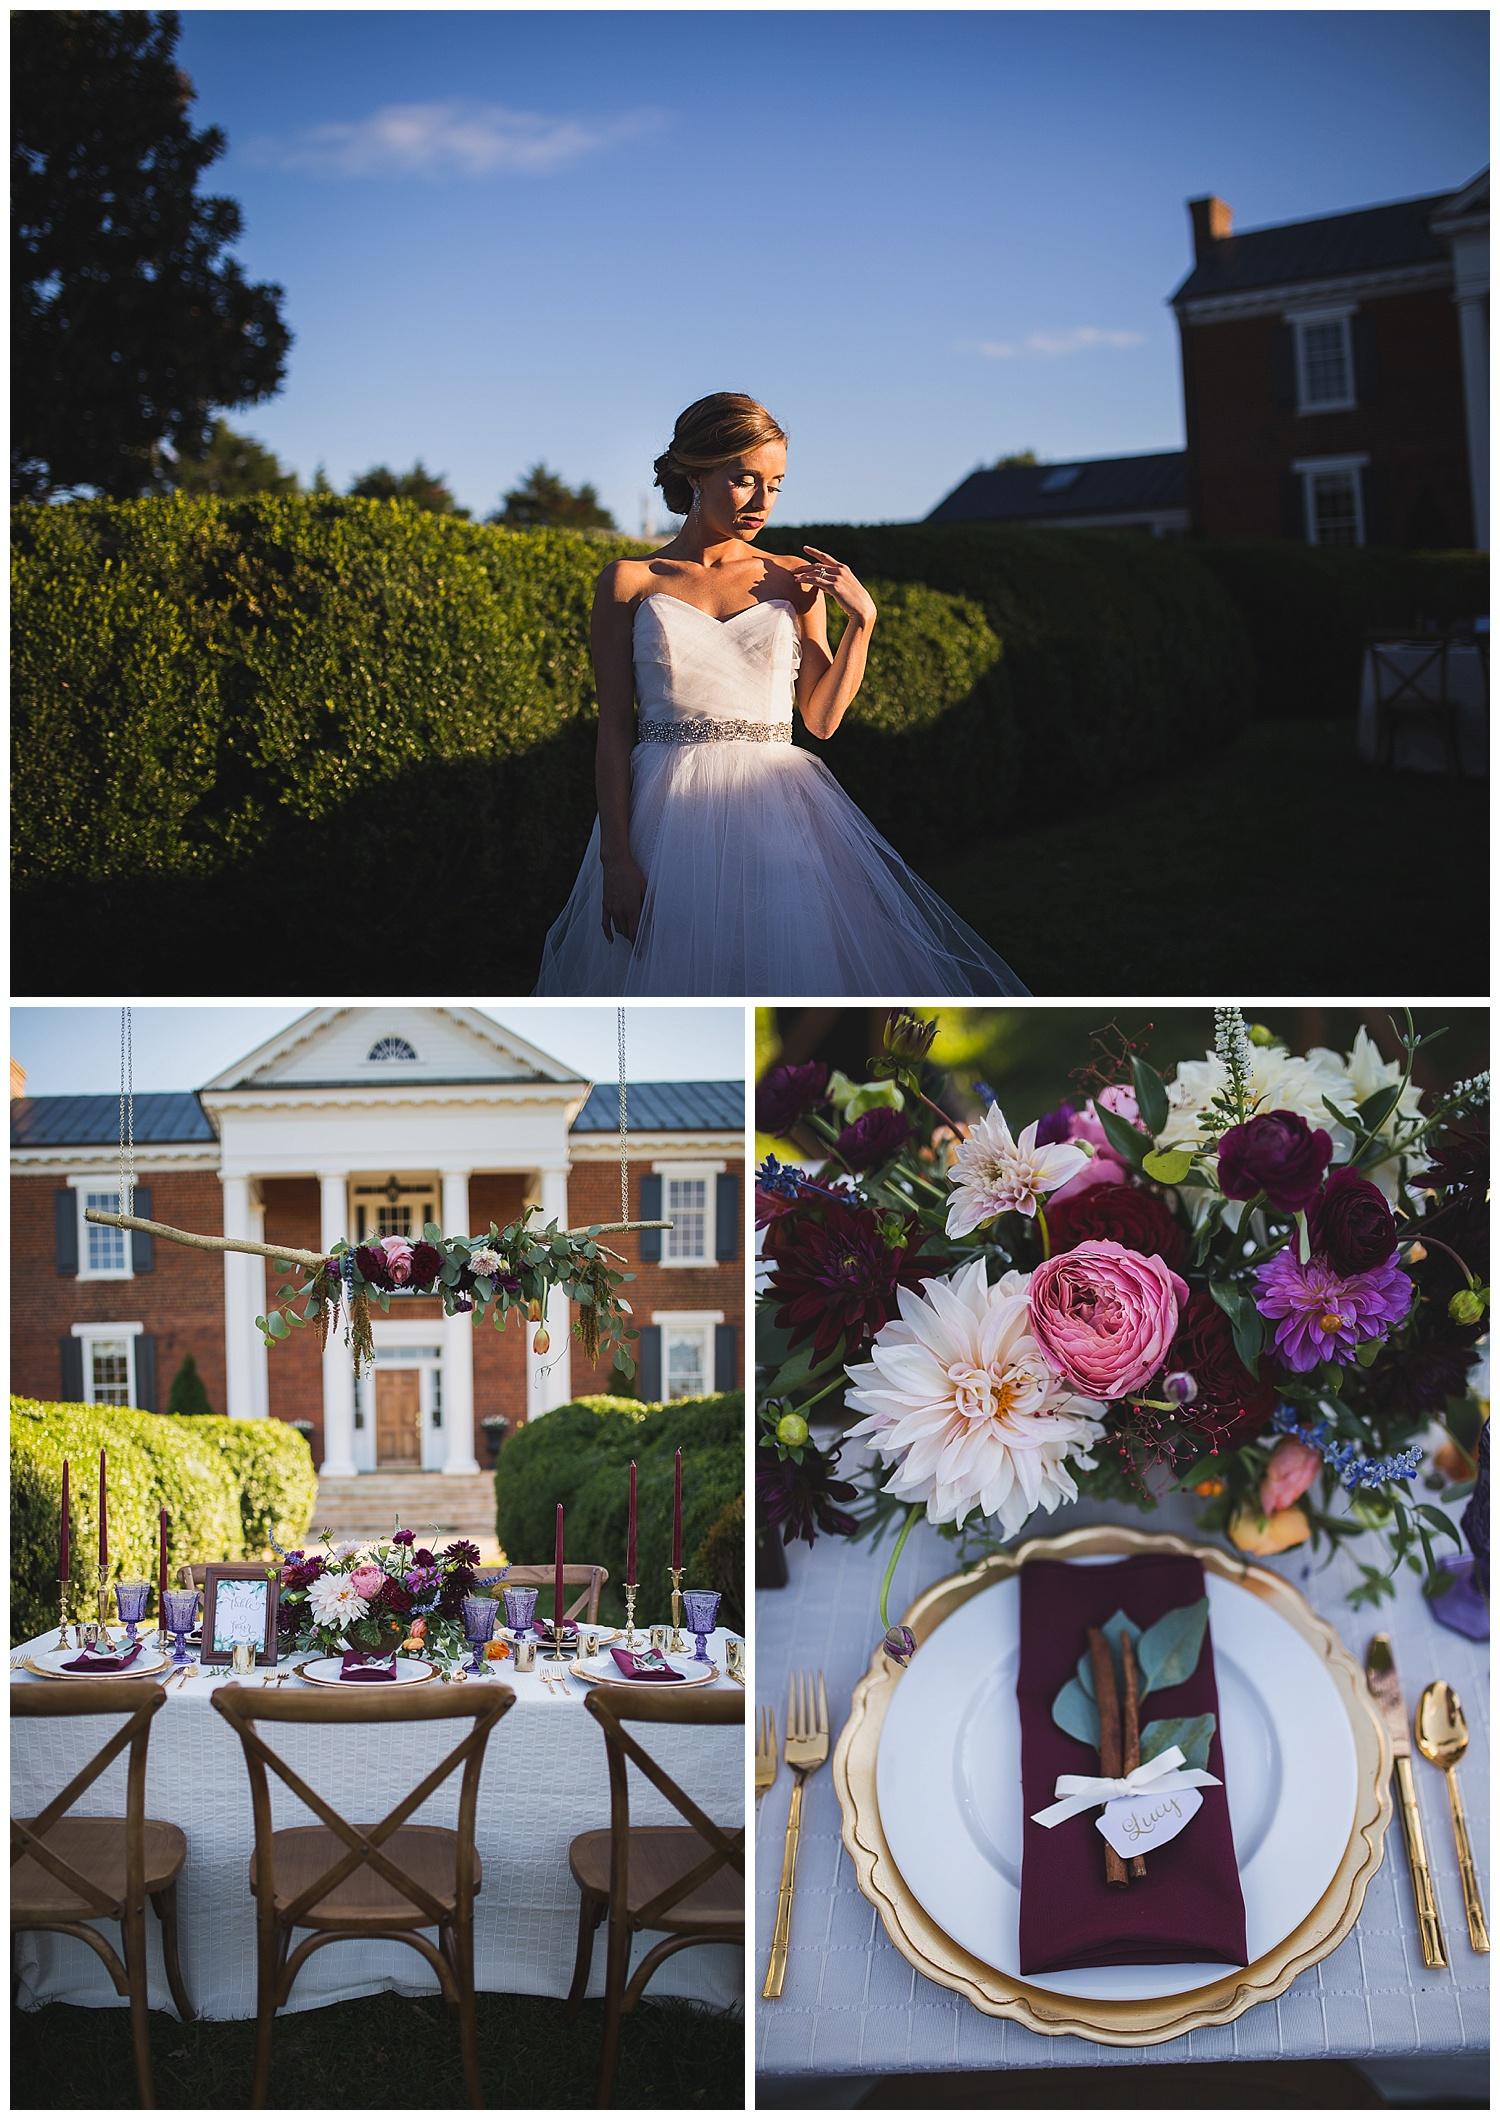 EmilyRogers-southwest-virginia-creative-wedding-photographer_0187.jpg